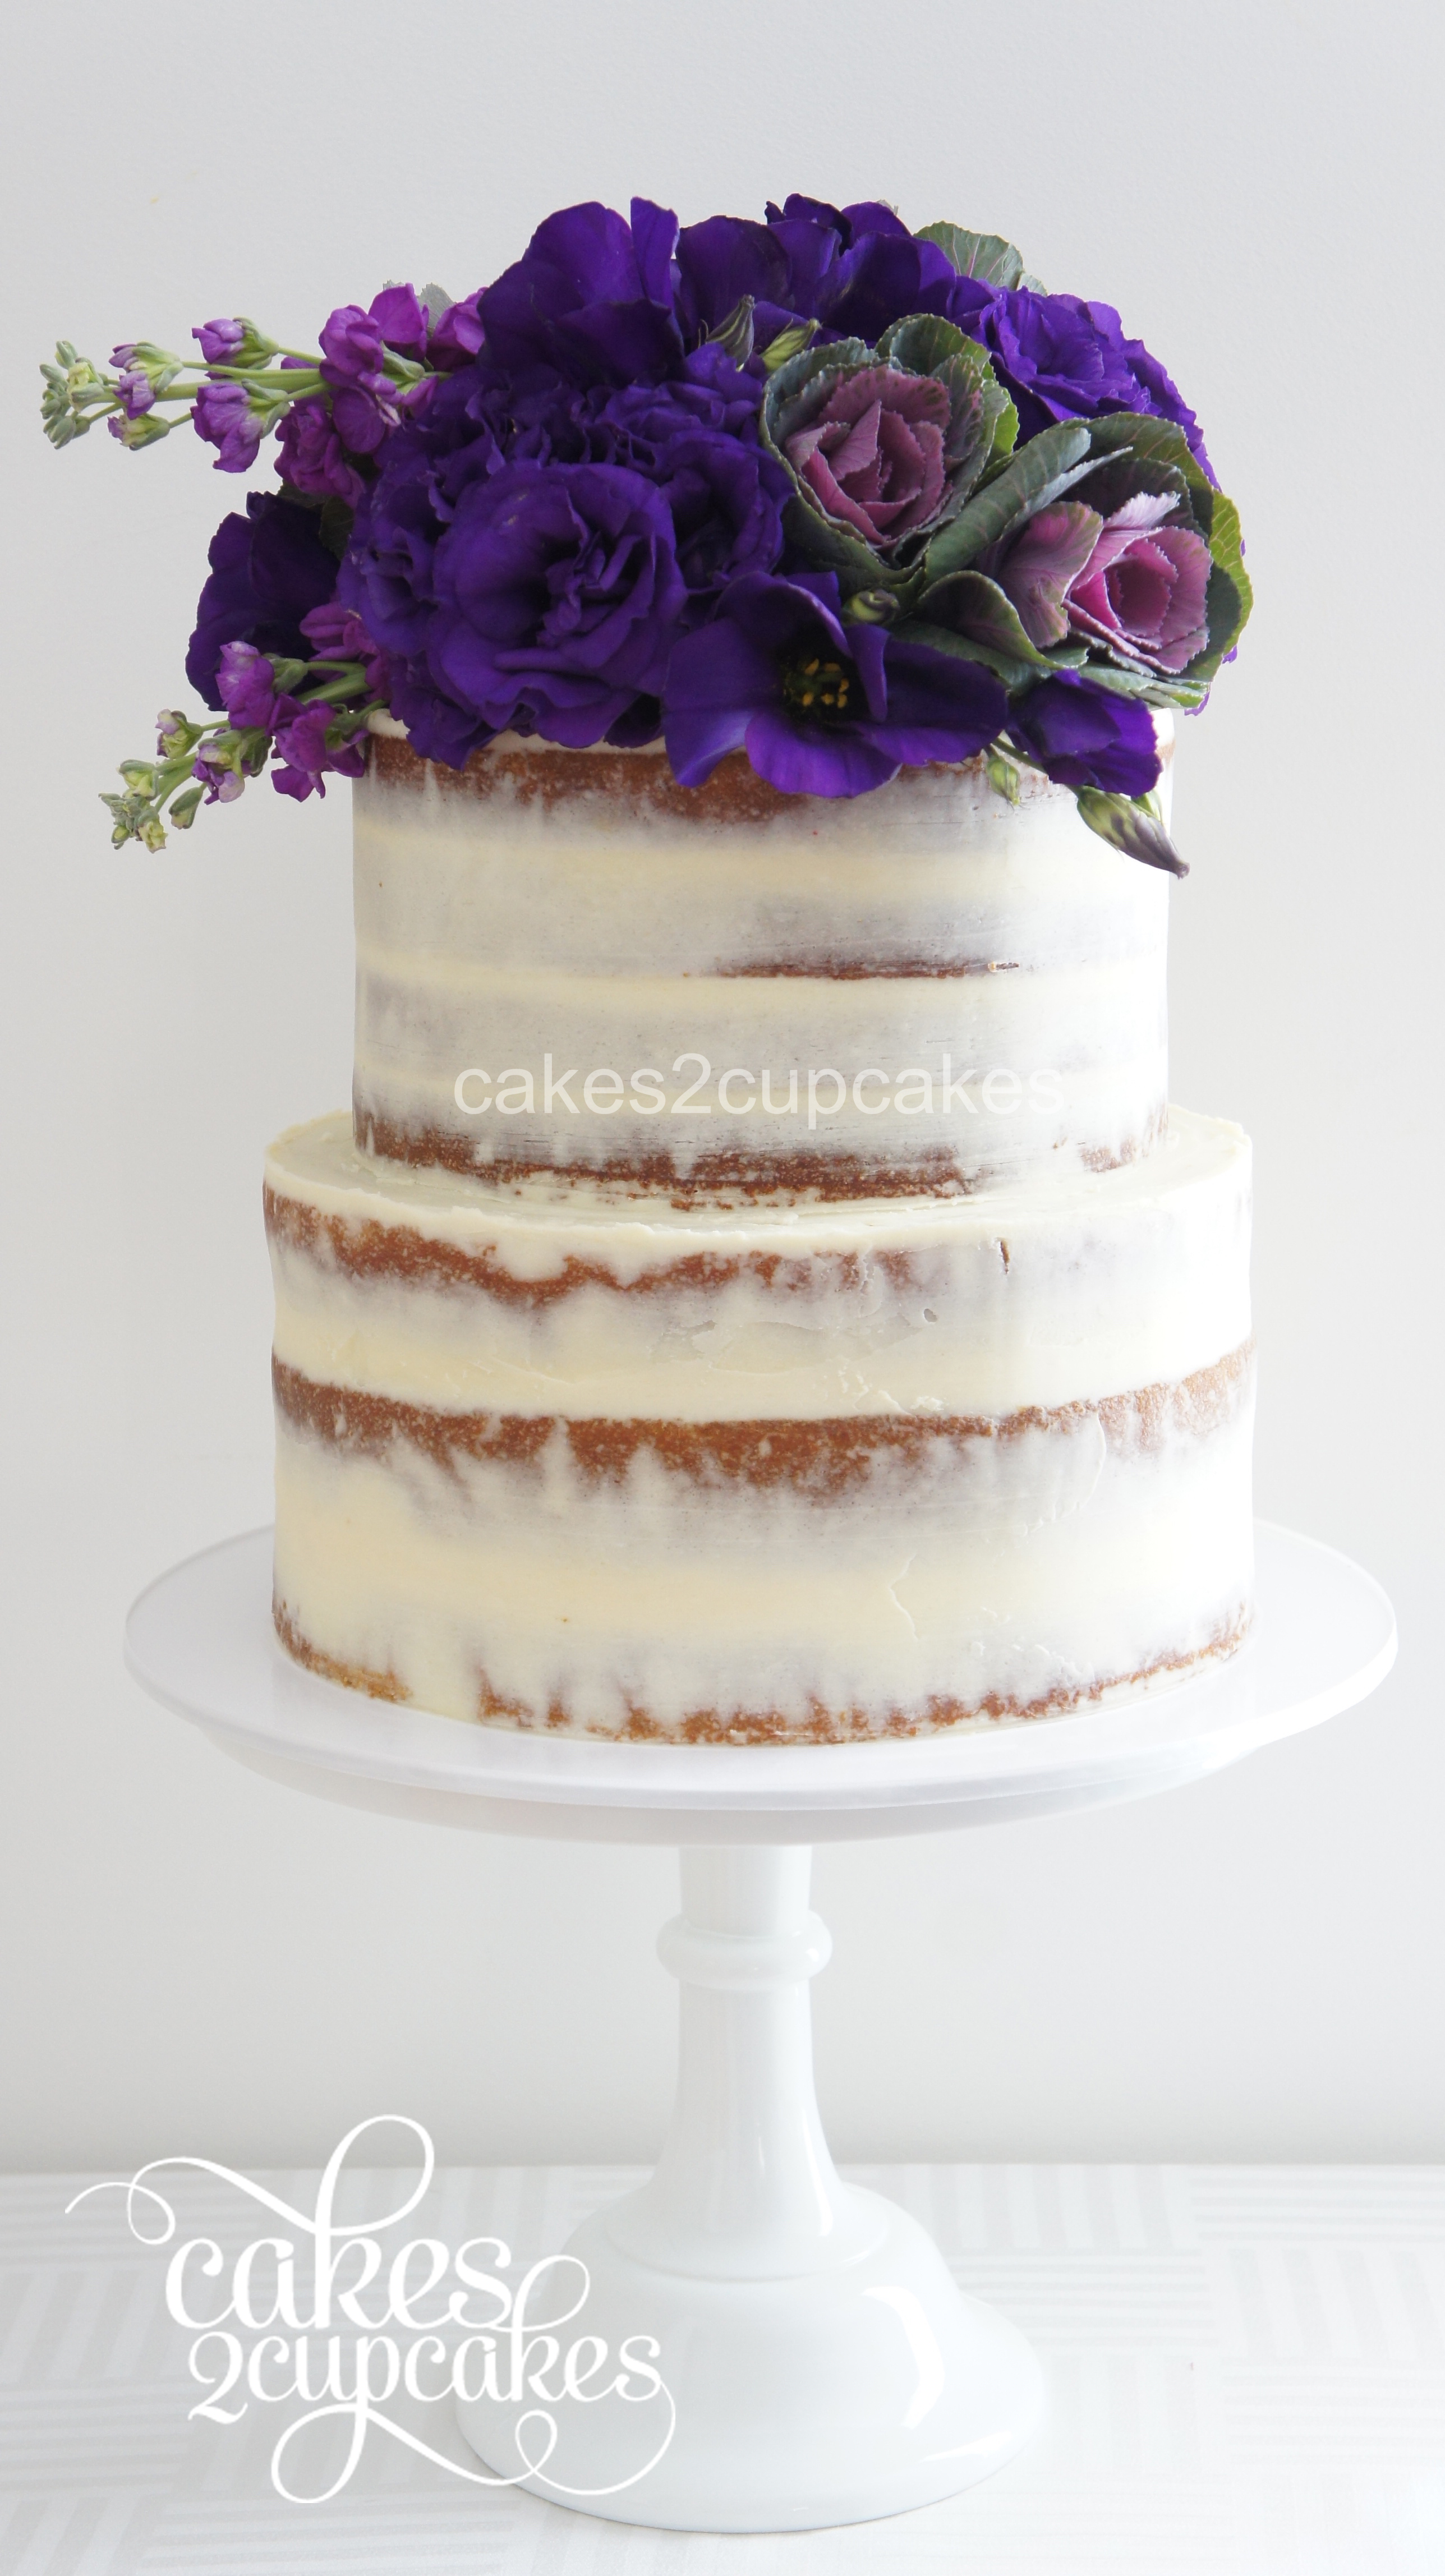 cakes2cupcakes-semi-iced.jpg